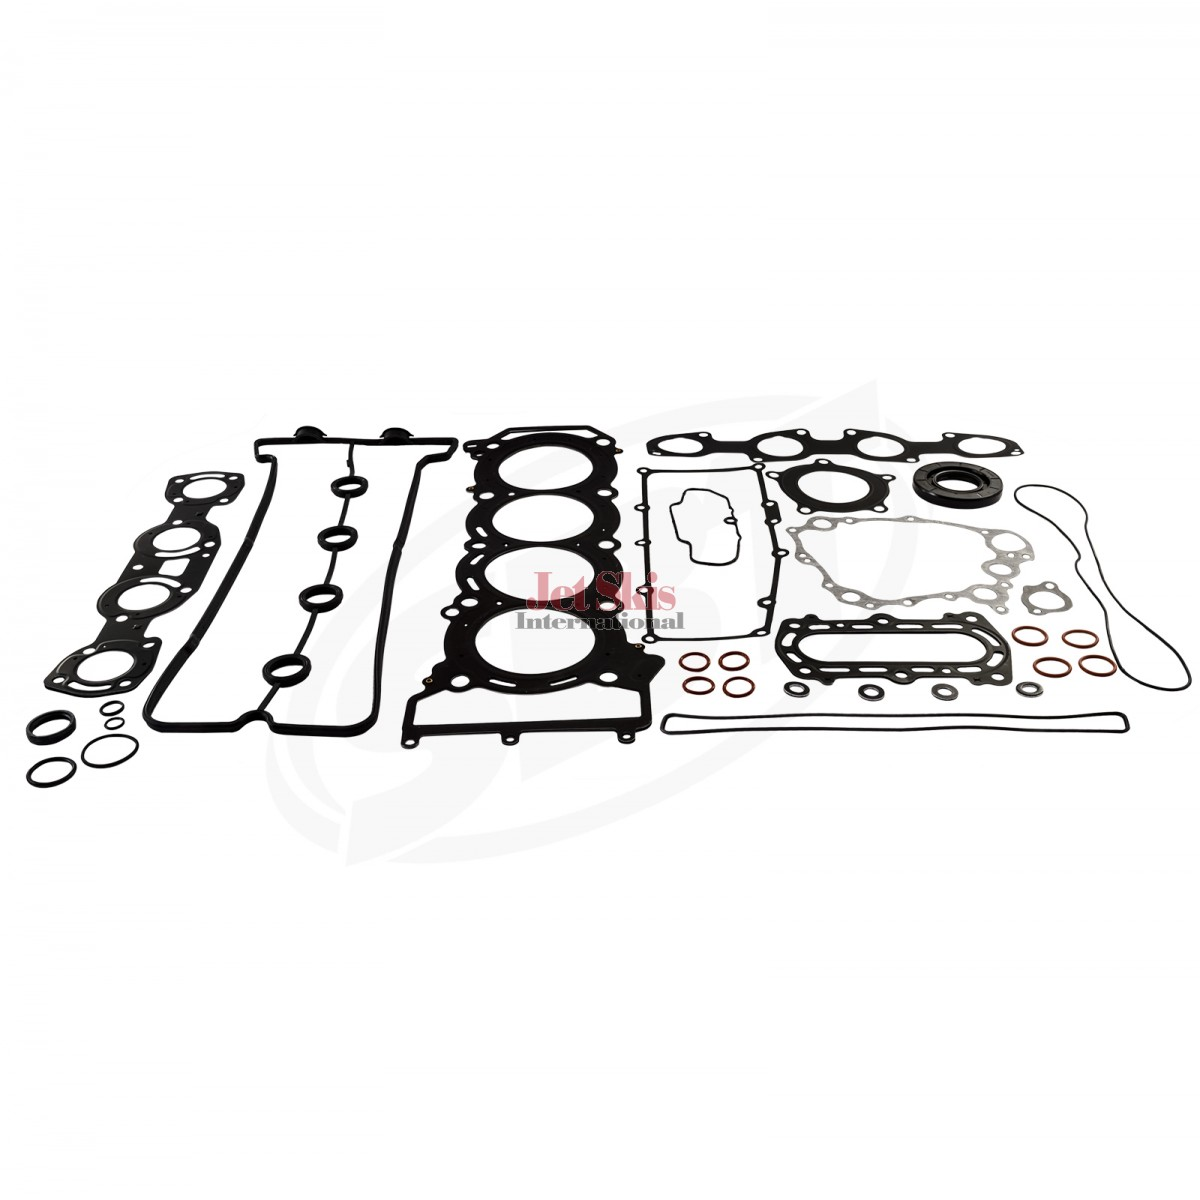 Yamaha Fxcruiser Sho Fzr Fzs Fx Sho Complete Gasket Kit